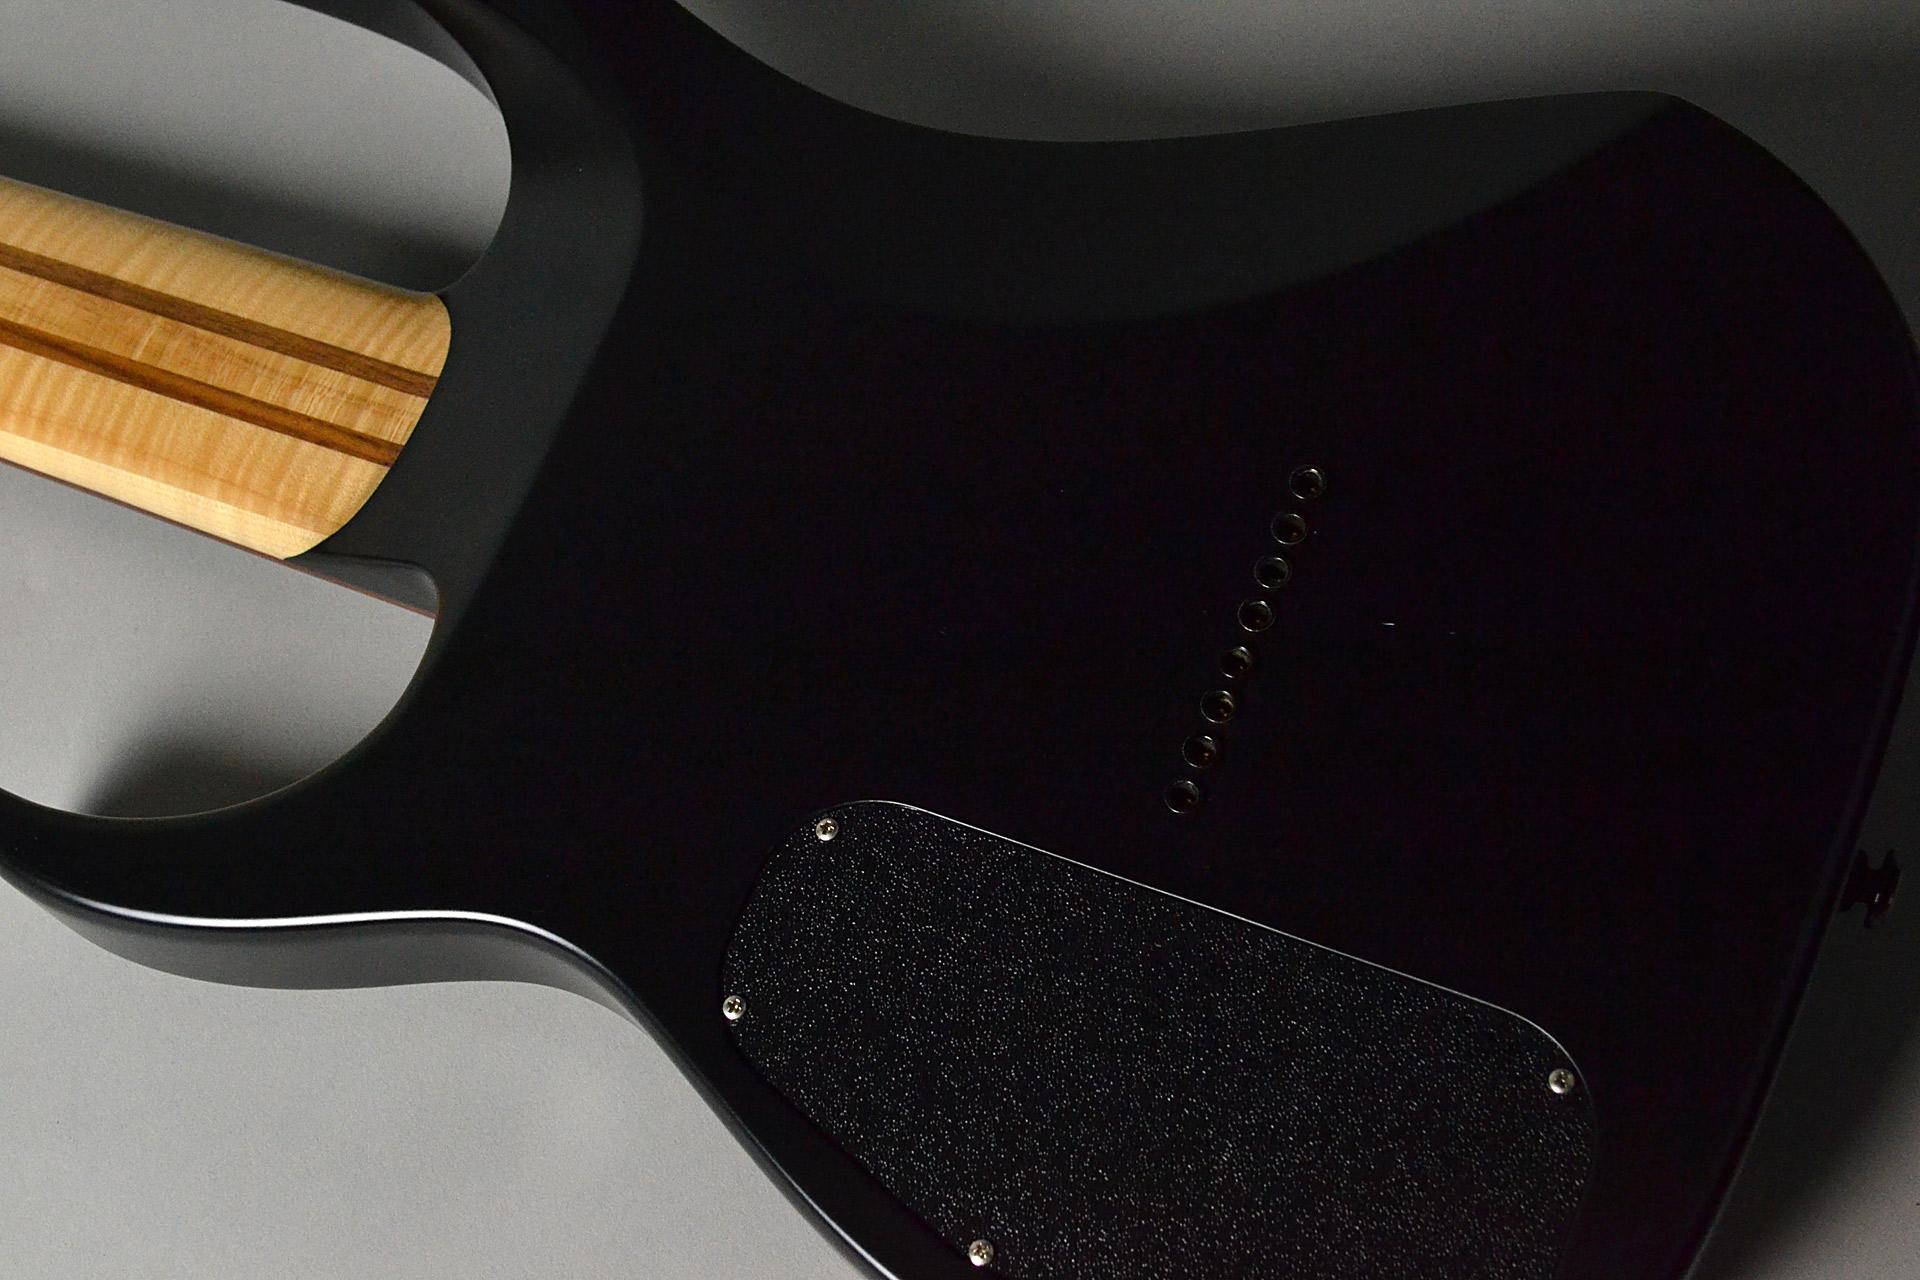 Cobra STD8 HT/T BKM Bloodwood Ionizer【長期在庫品・大特価】のボディバック-アップ画像